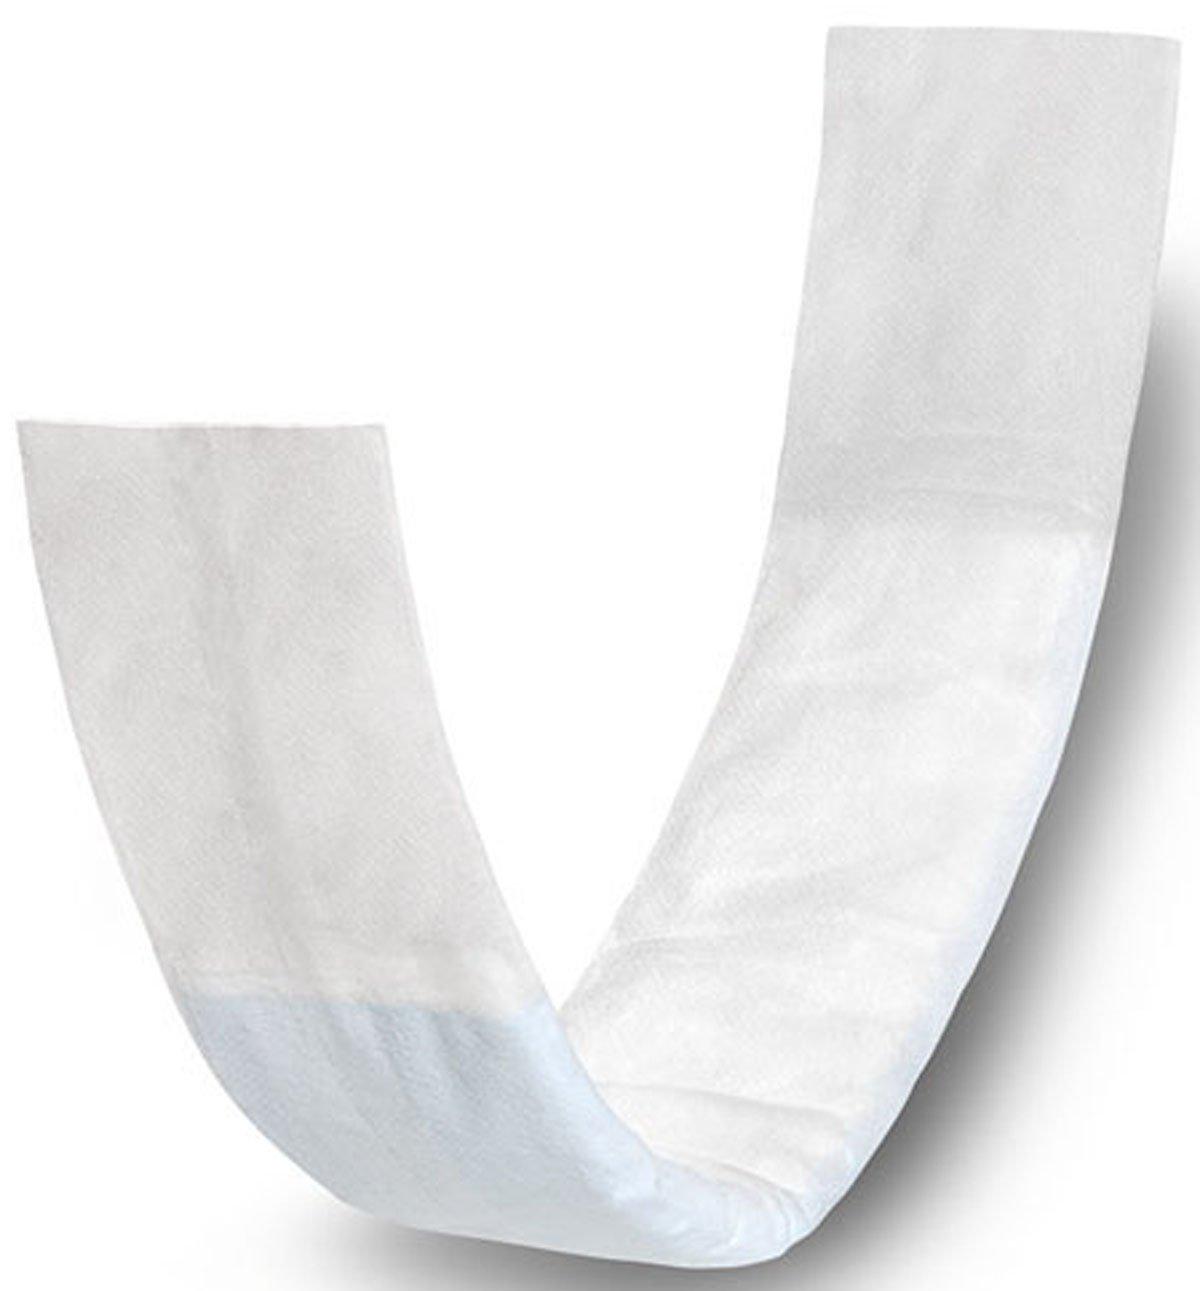 Medline NON241280 Maternity Feminine Hygiene Pads with Tails